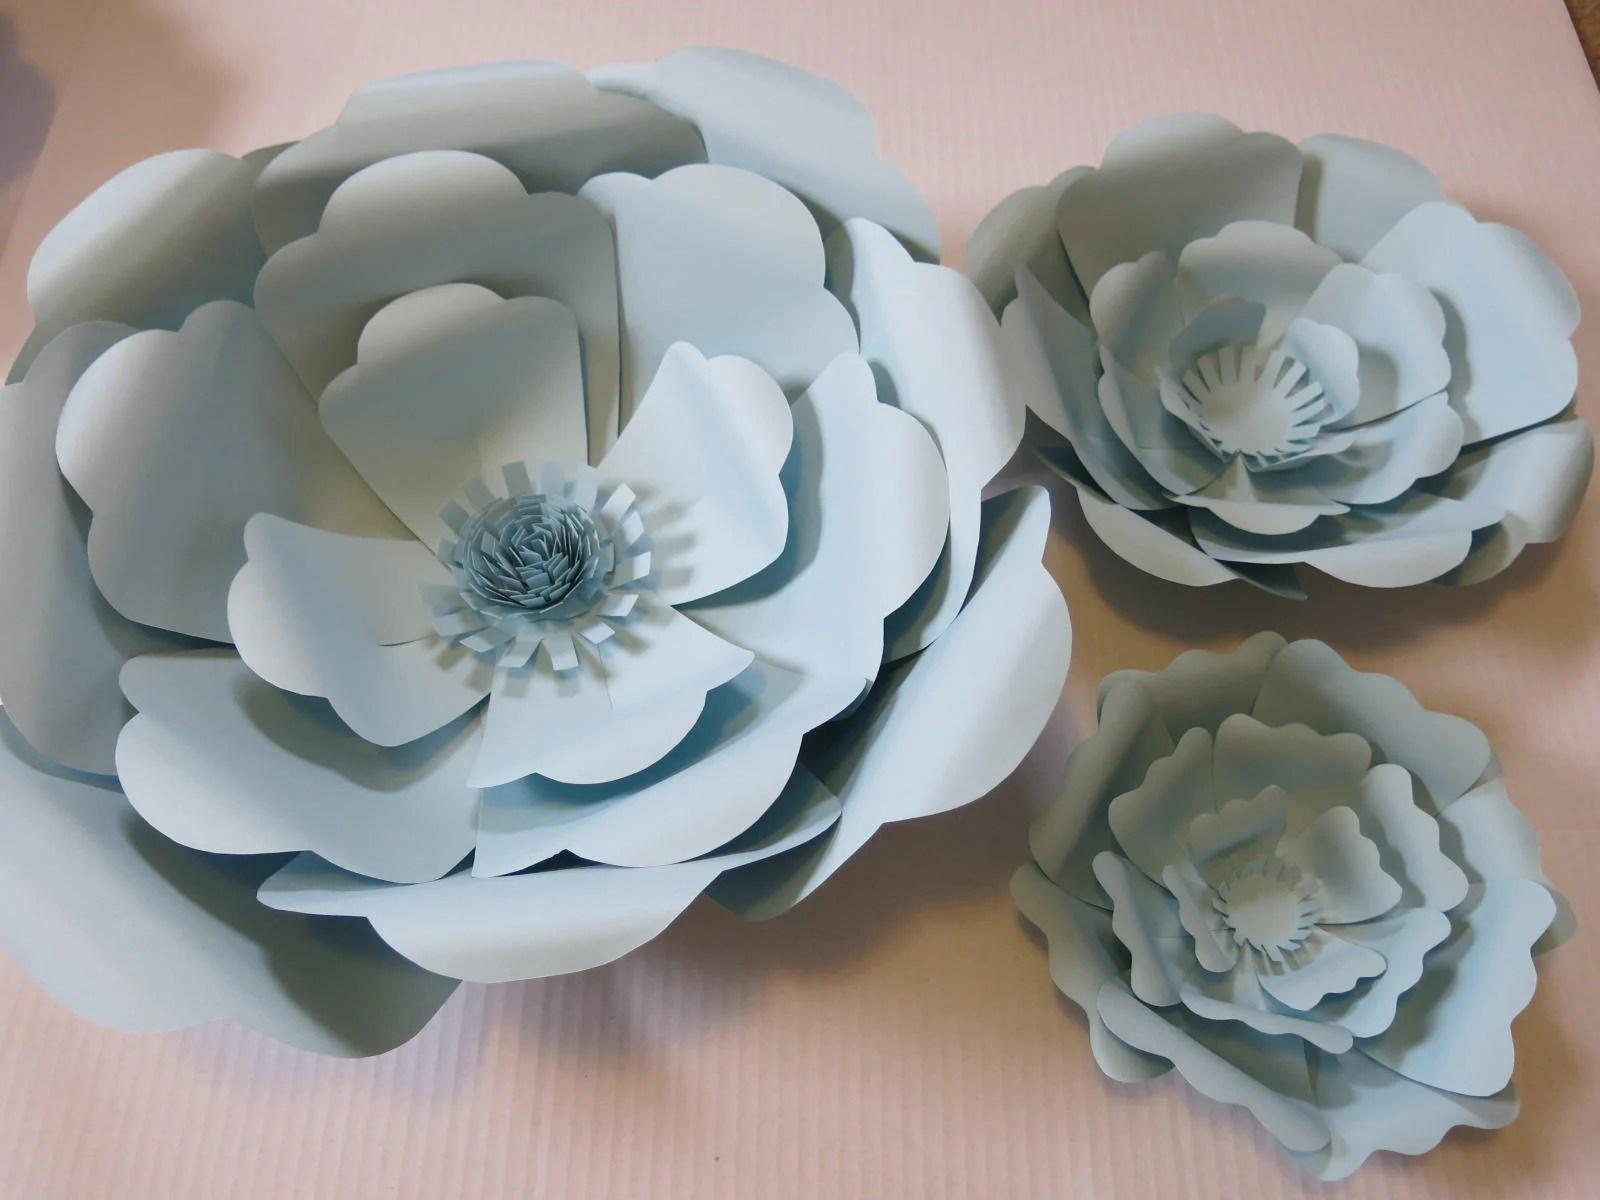 Set of 3 Pastel Blue Giant Paper Flowers Light Blue Roses